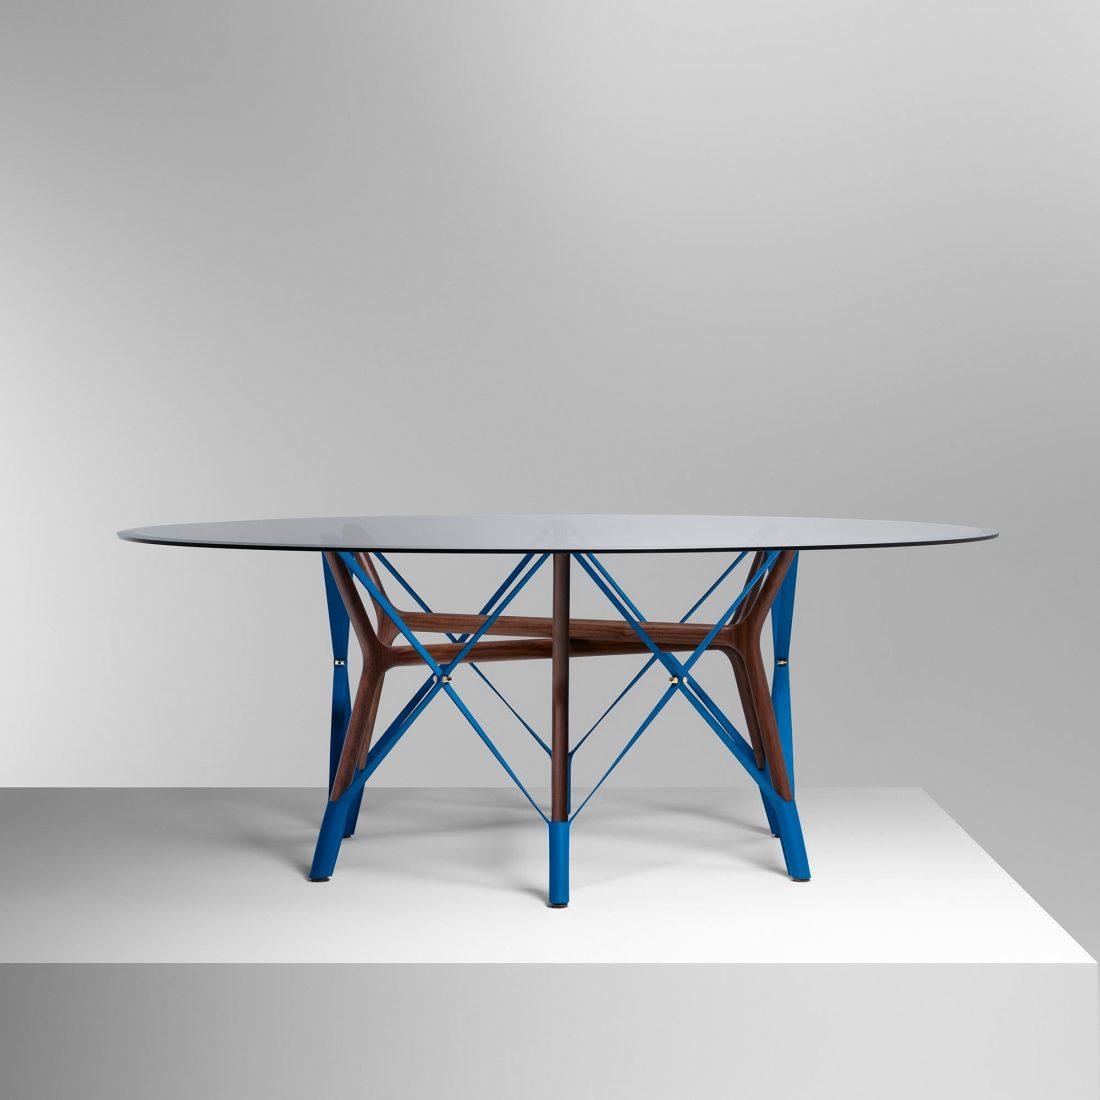 Atelier Oi Serpentine Table